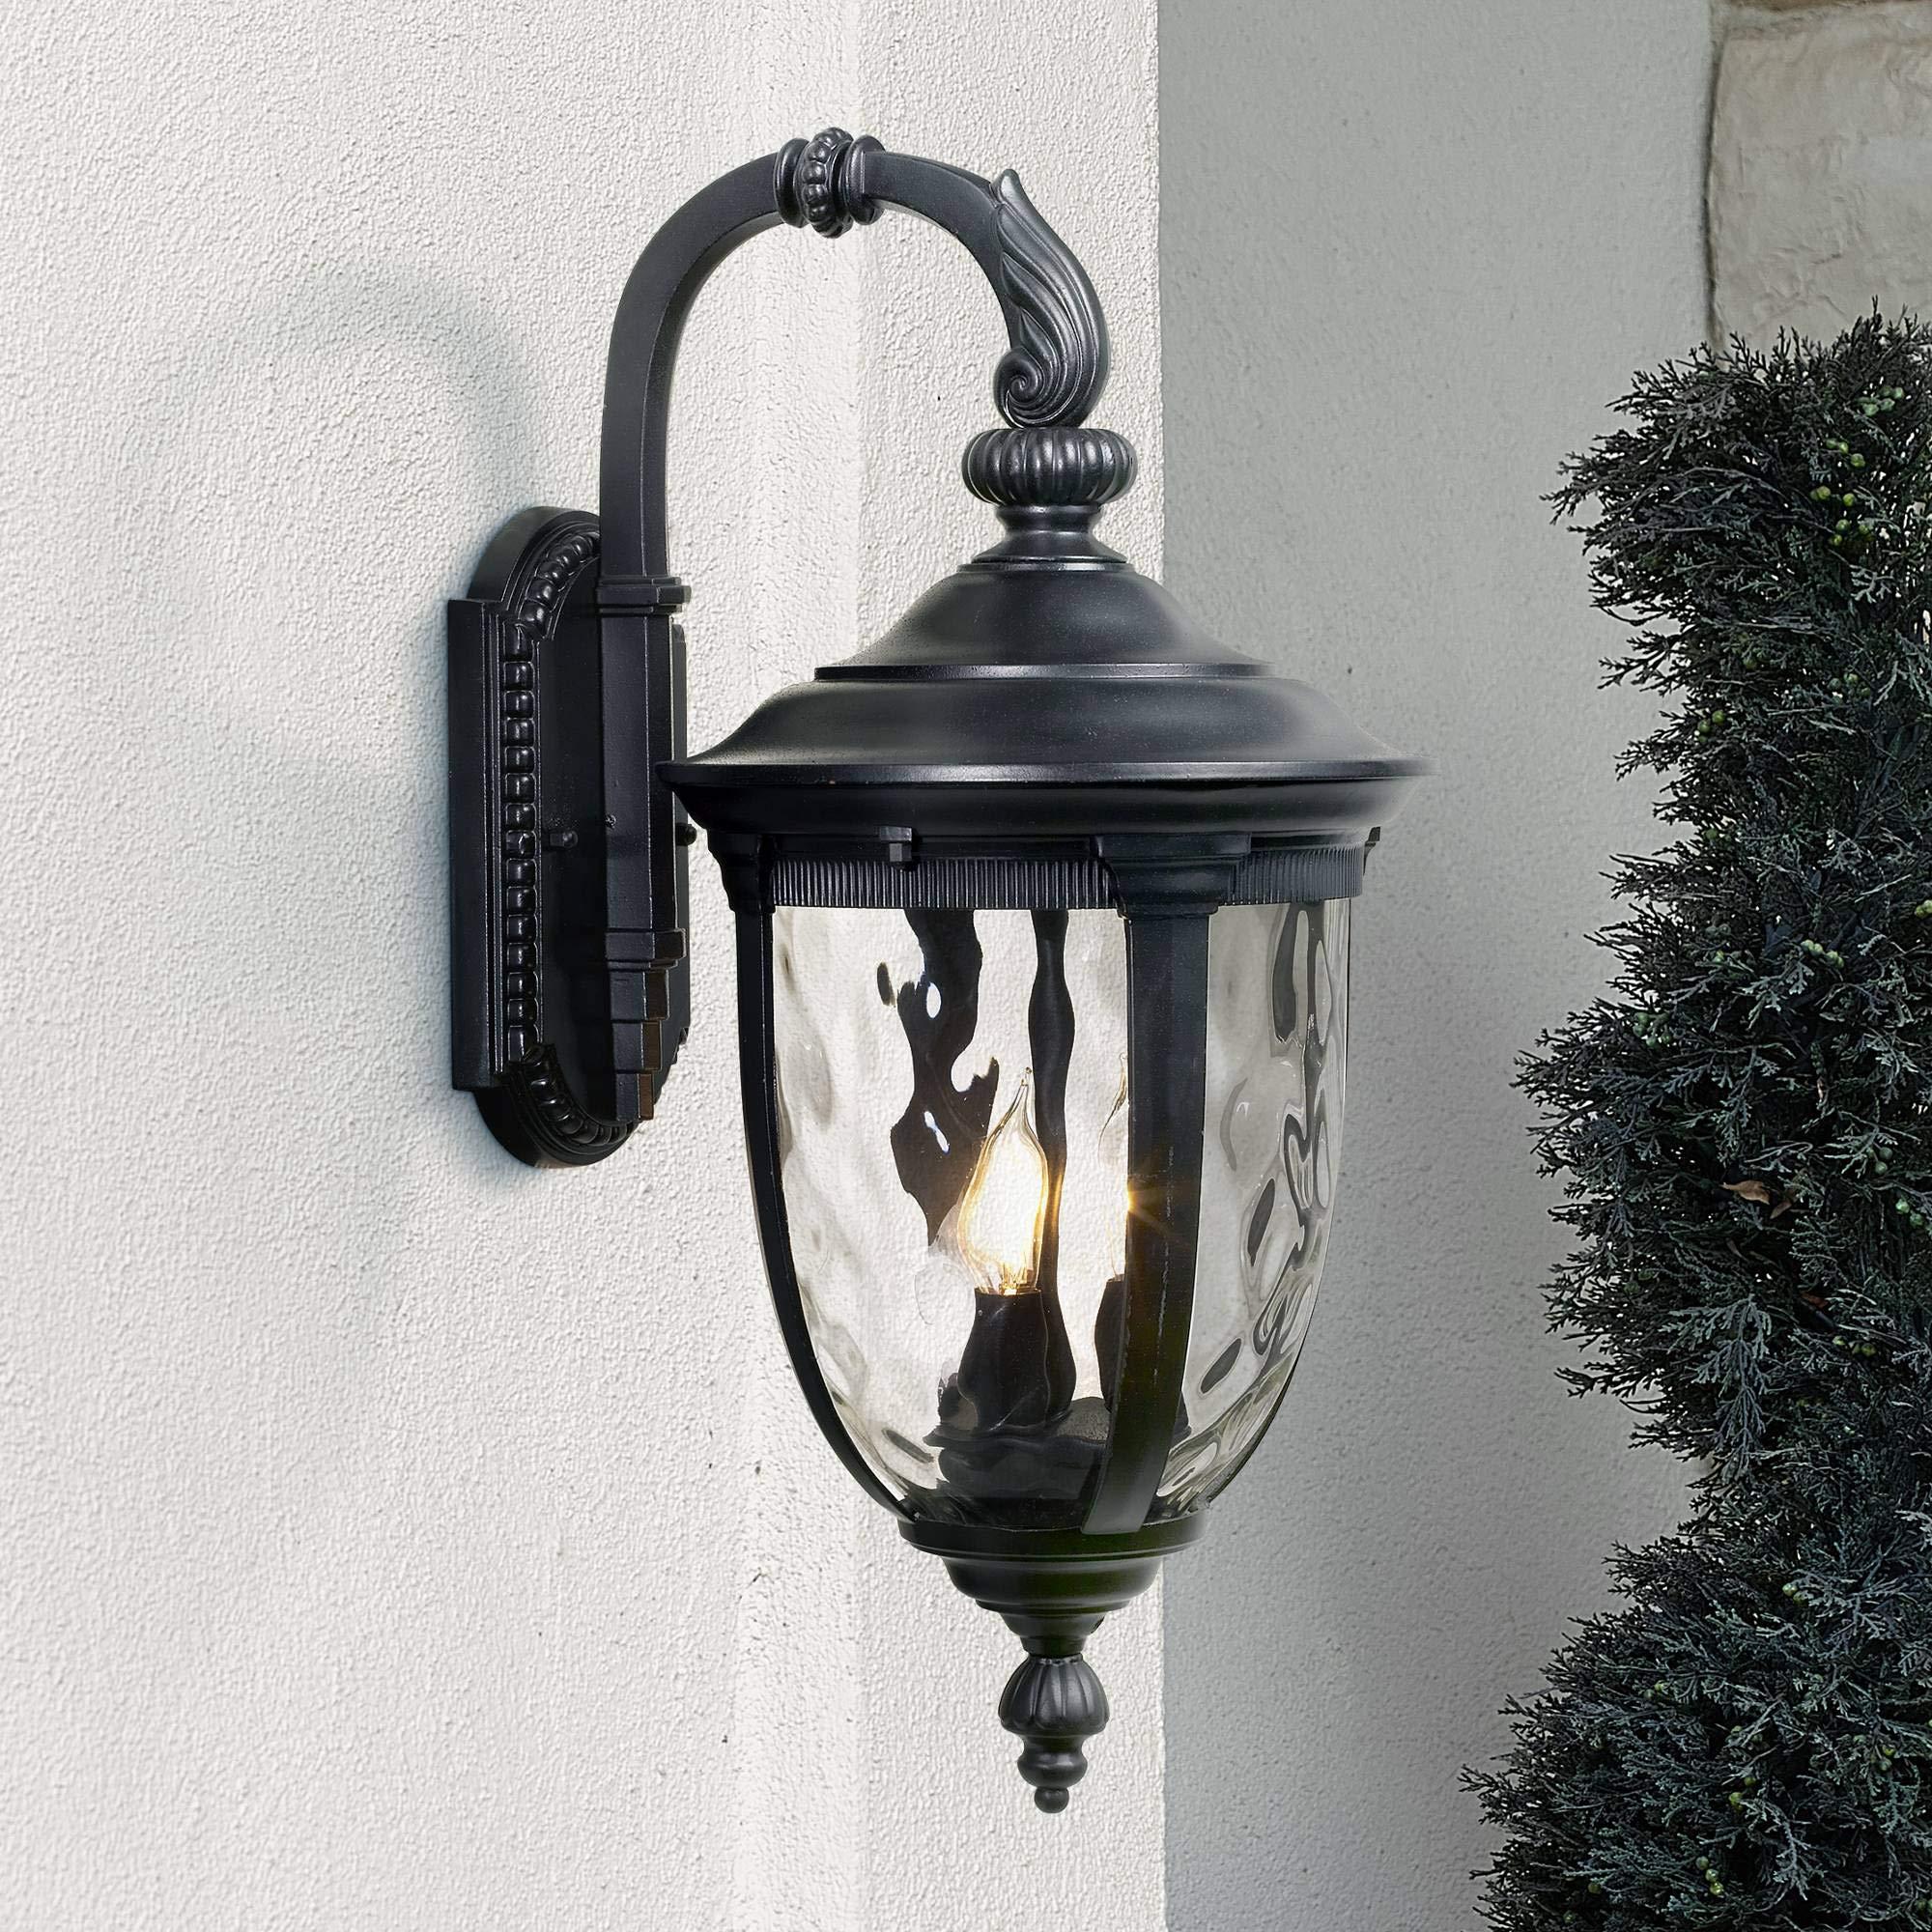 Bellagio Outdoor Wall Light Fixture Textured Black 20 1/2'' Hammered Glass Exterior House Patio Porch - John Timberland